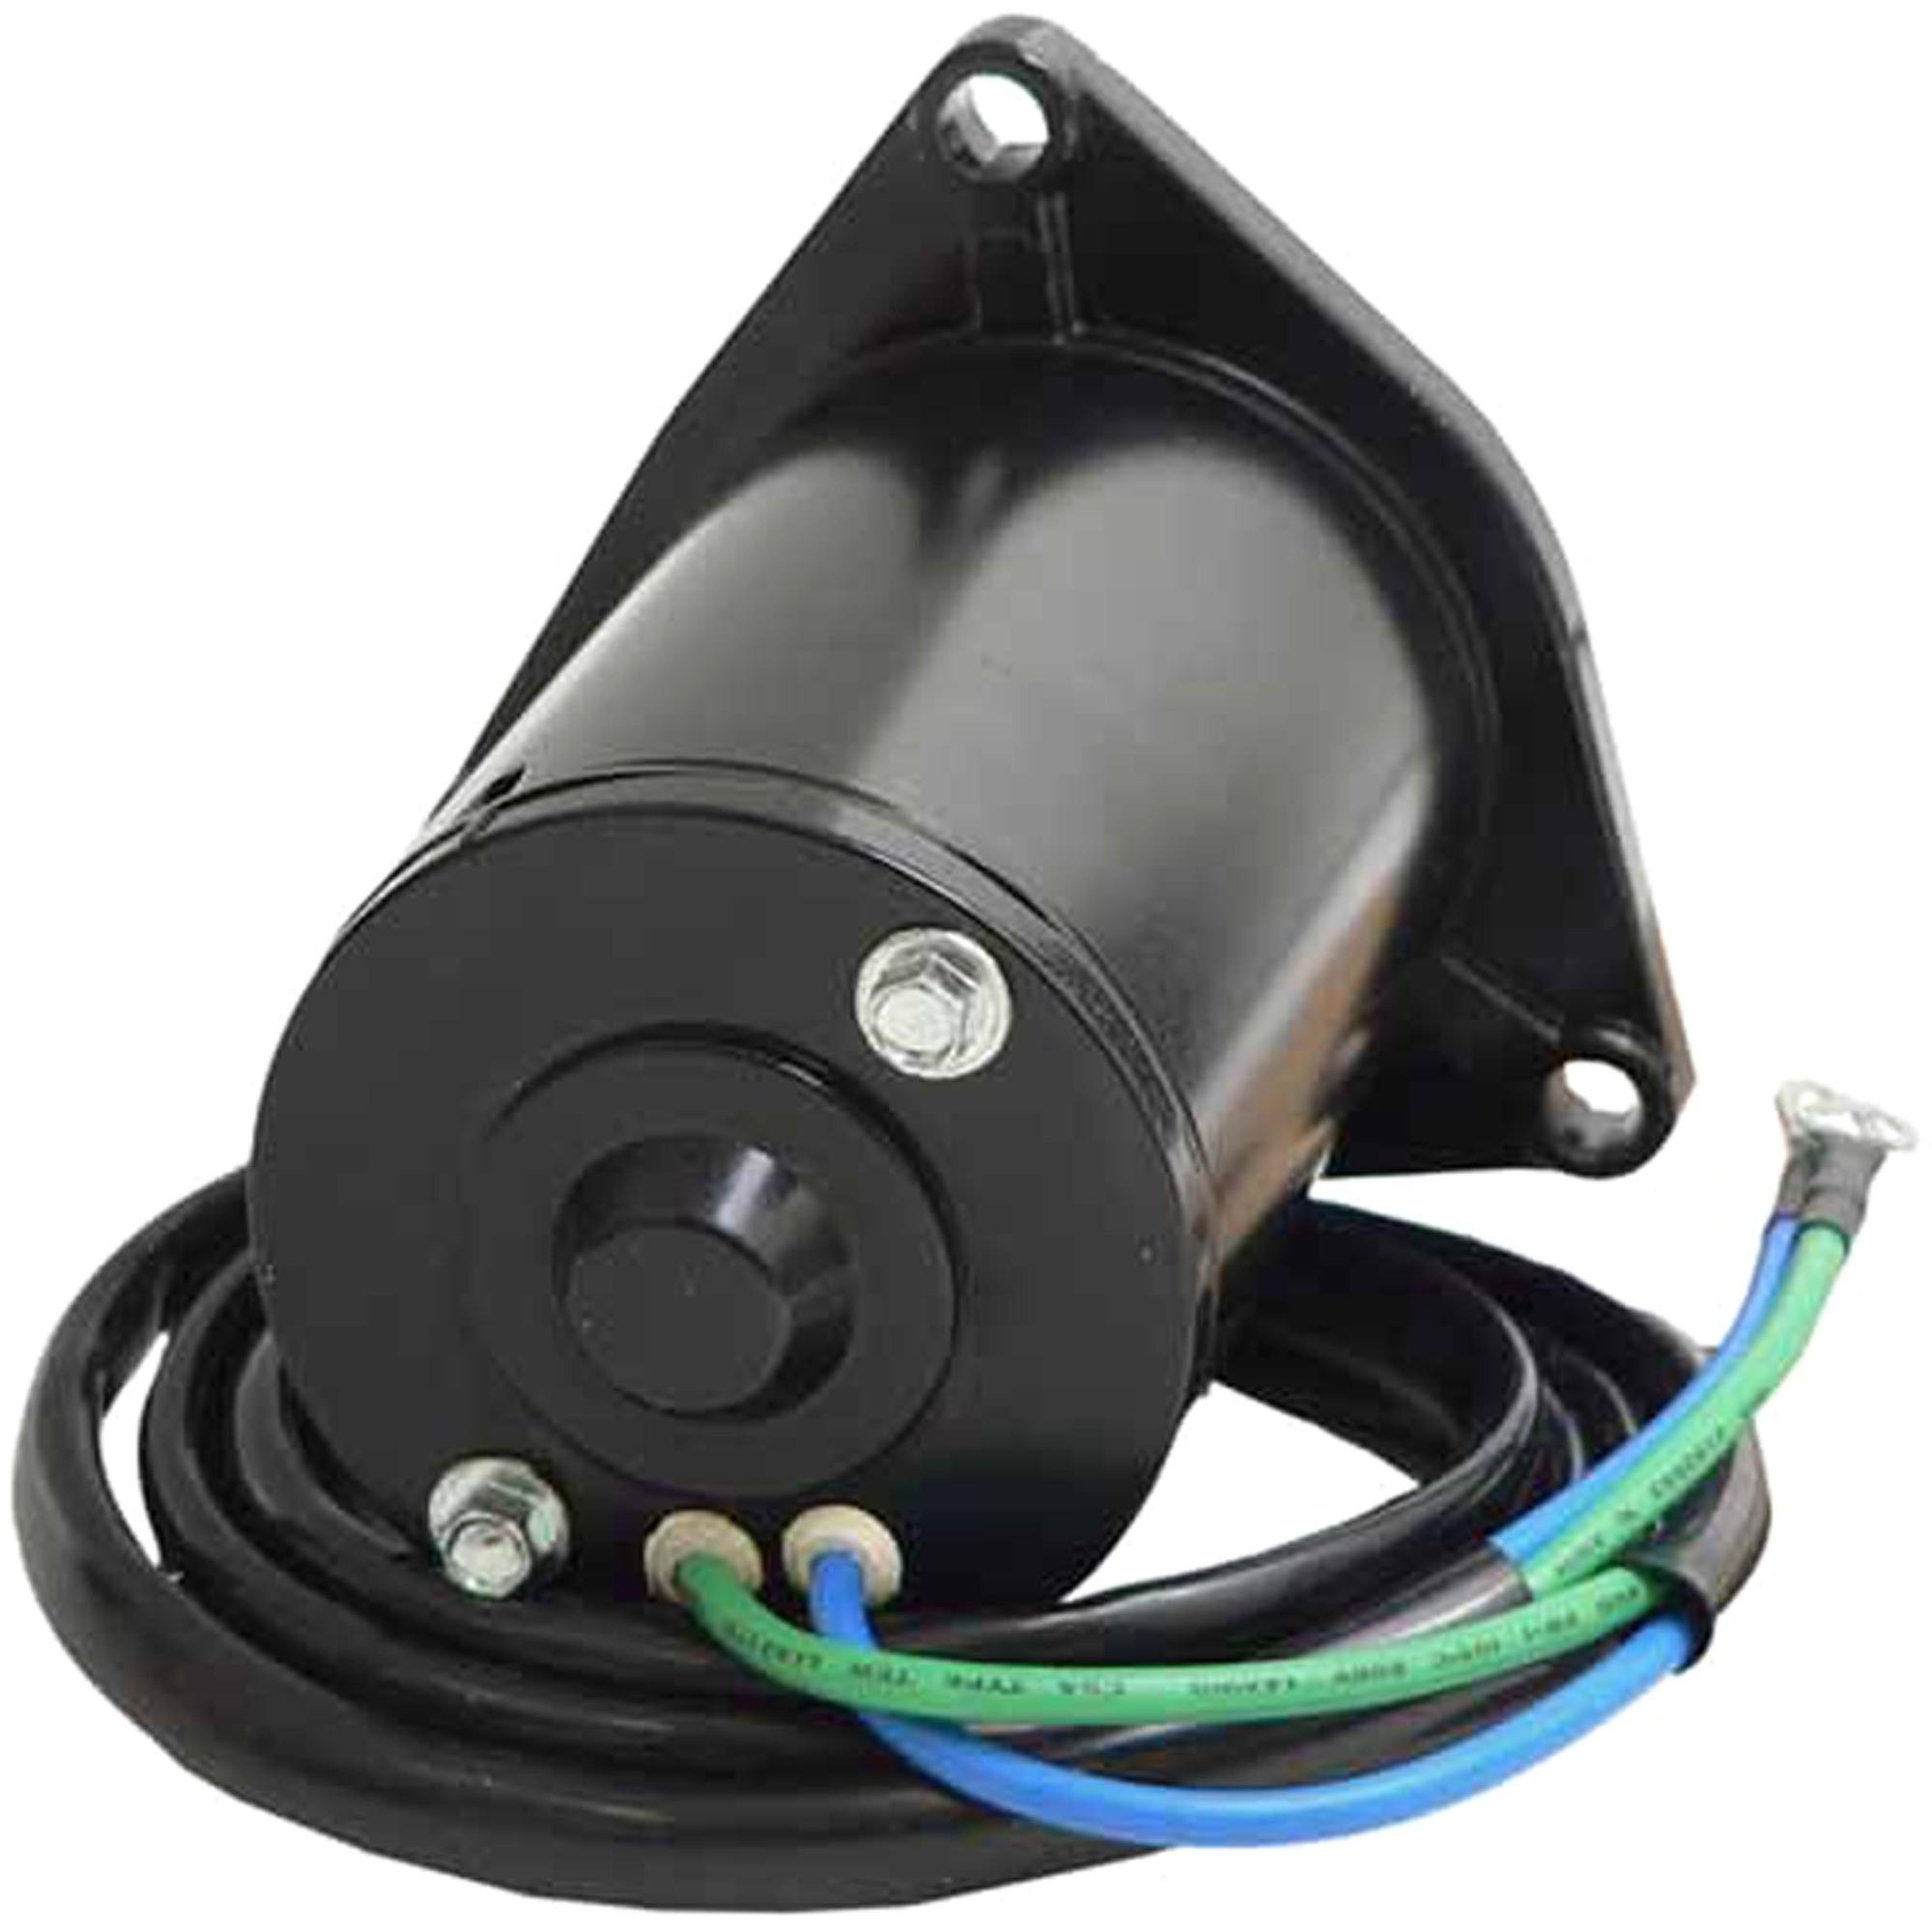 Tilt Trim Motor Yamaha 40 50 6H5-43880-02-00 NEW Outboard Marine 430-22059 10836